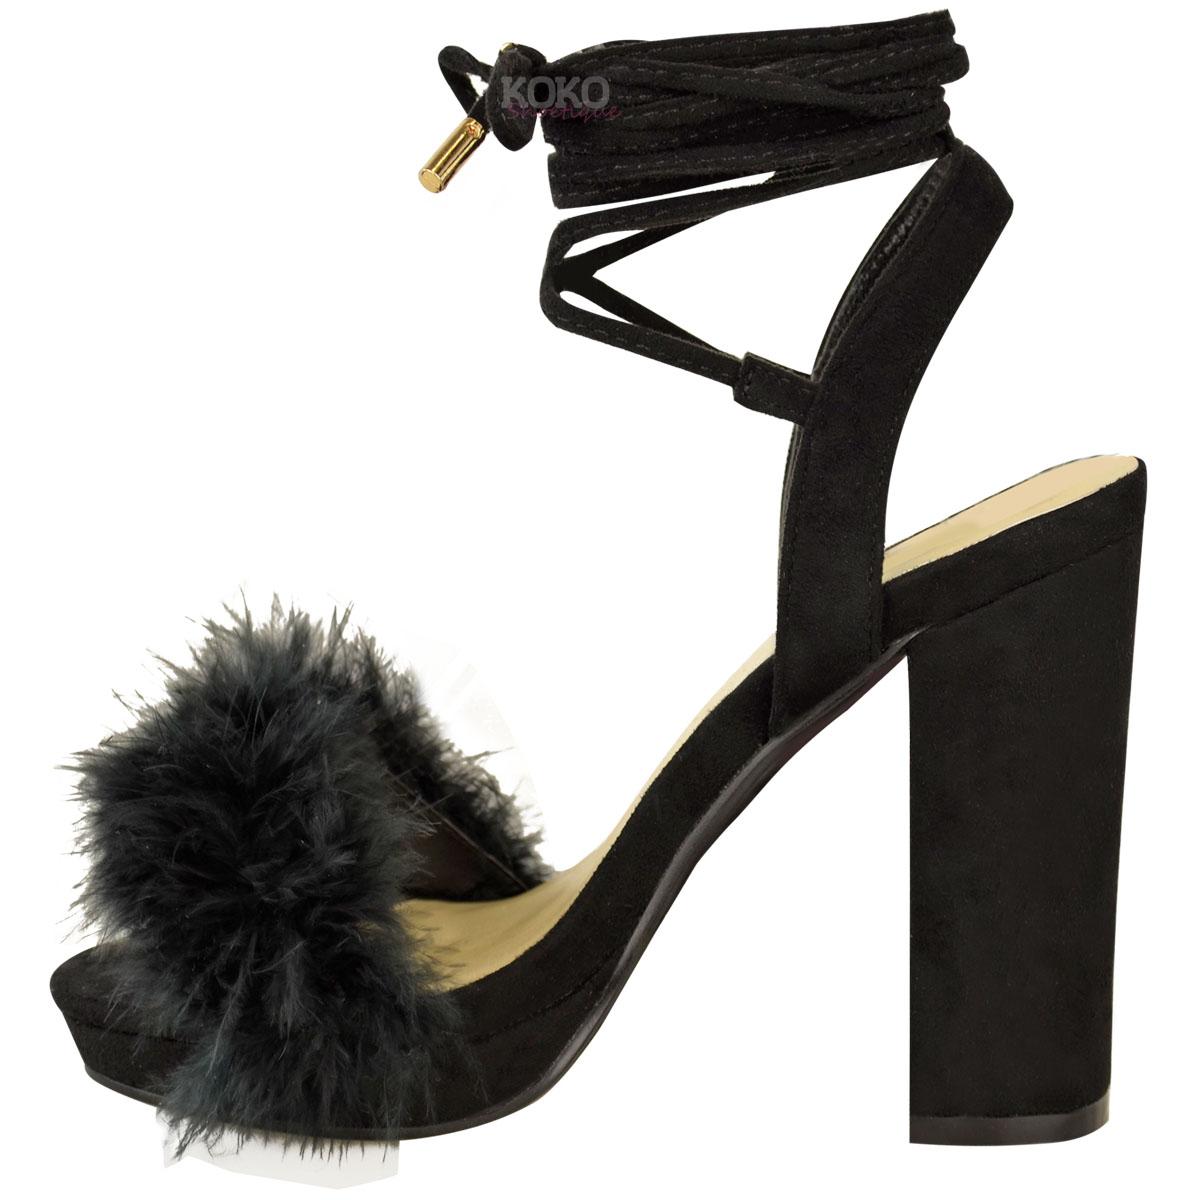 faa8c171c94 Womens Ladies Block High Heel Sandals Ankle Tie Up Fur Strappy ...